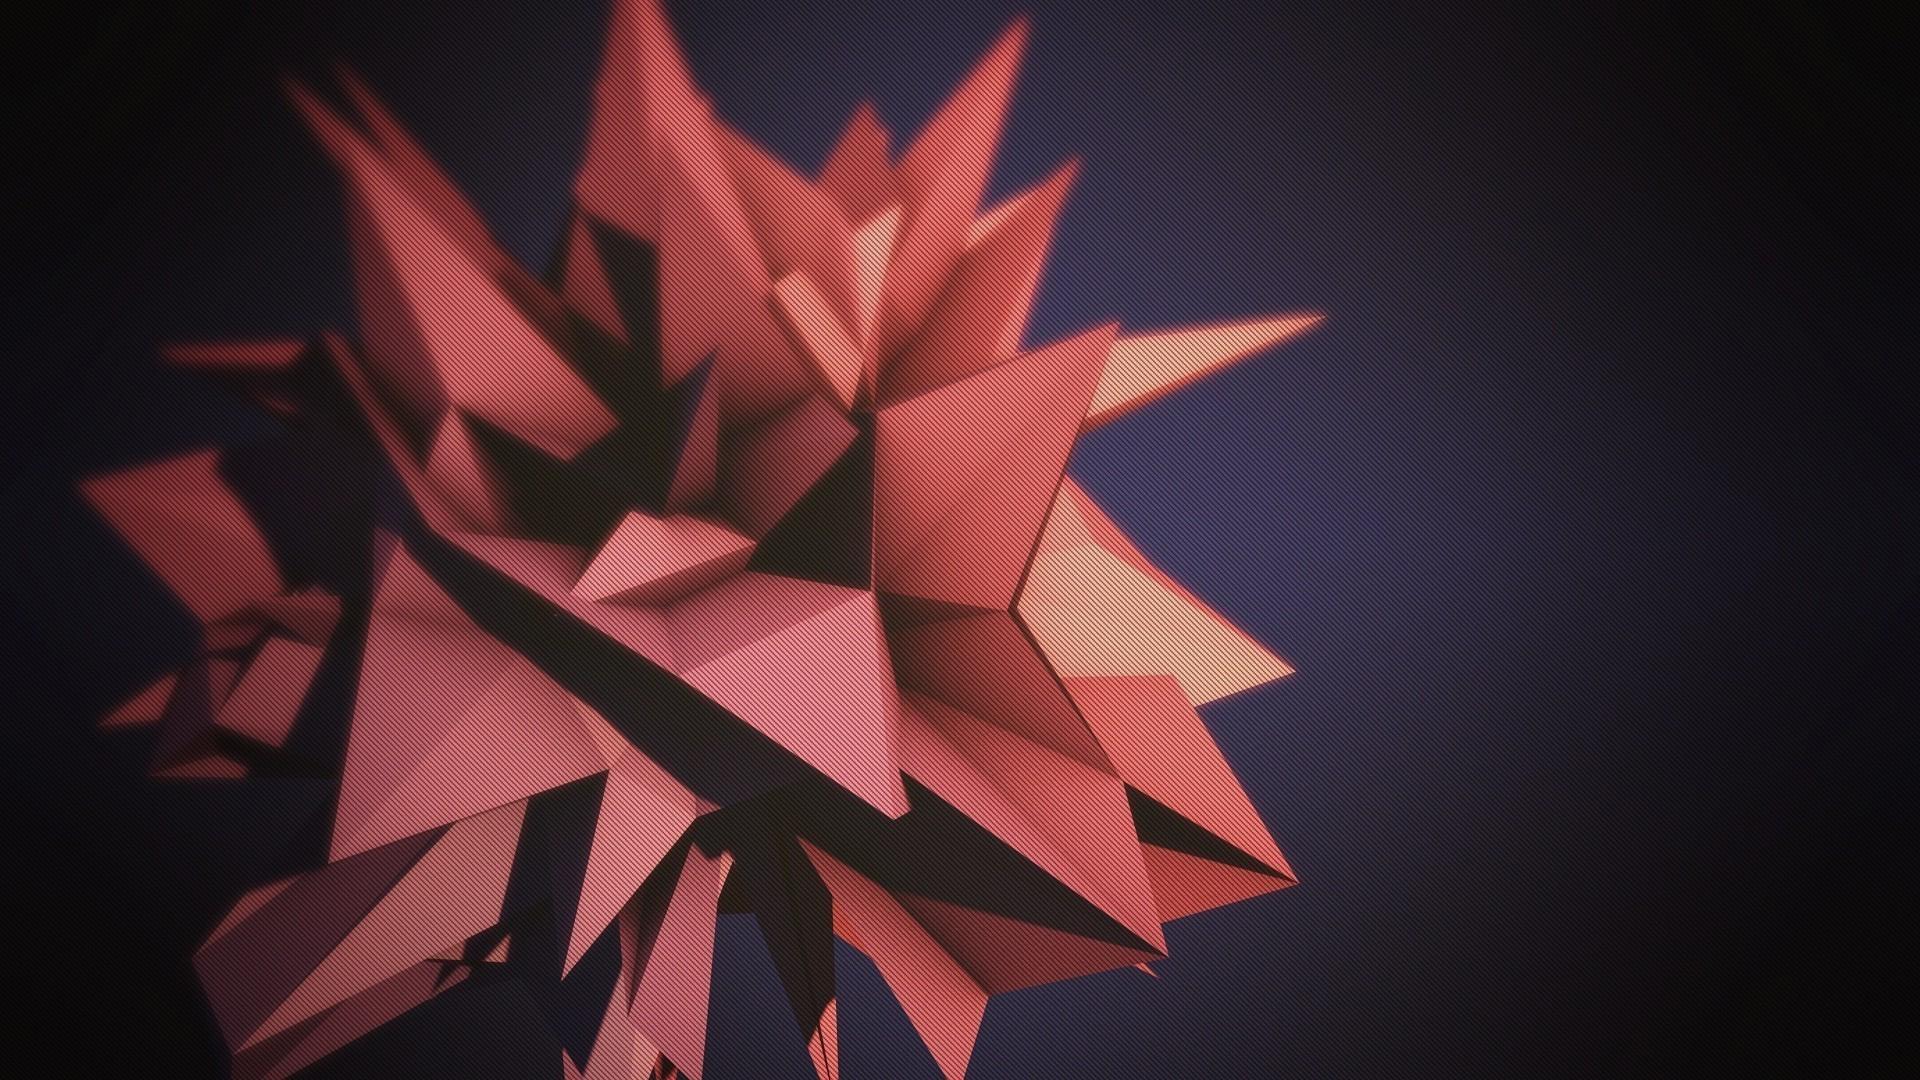 Polygon starry shape HD wallpaper | 3D Desktop Wallpaper